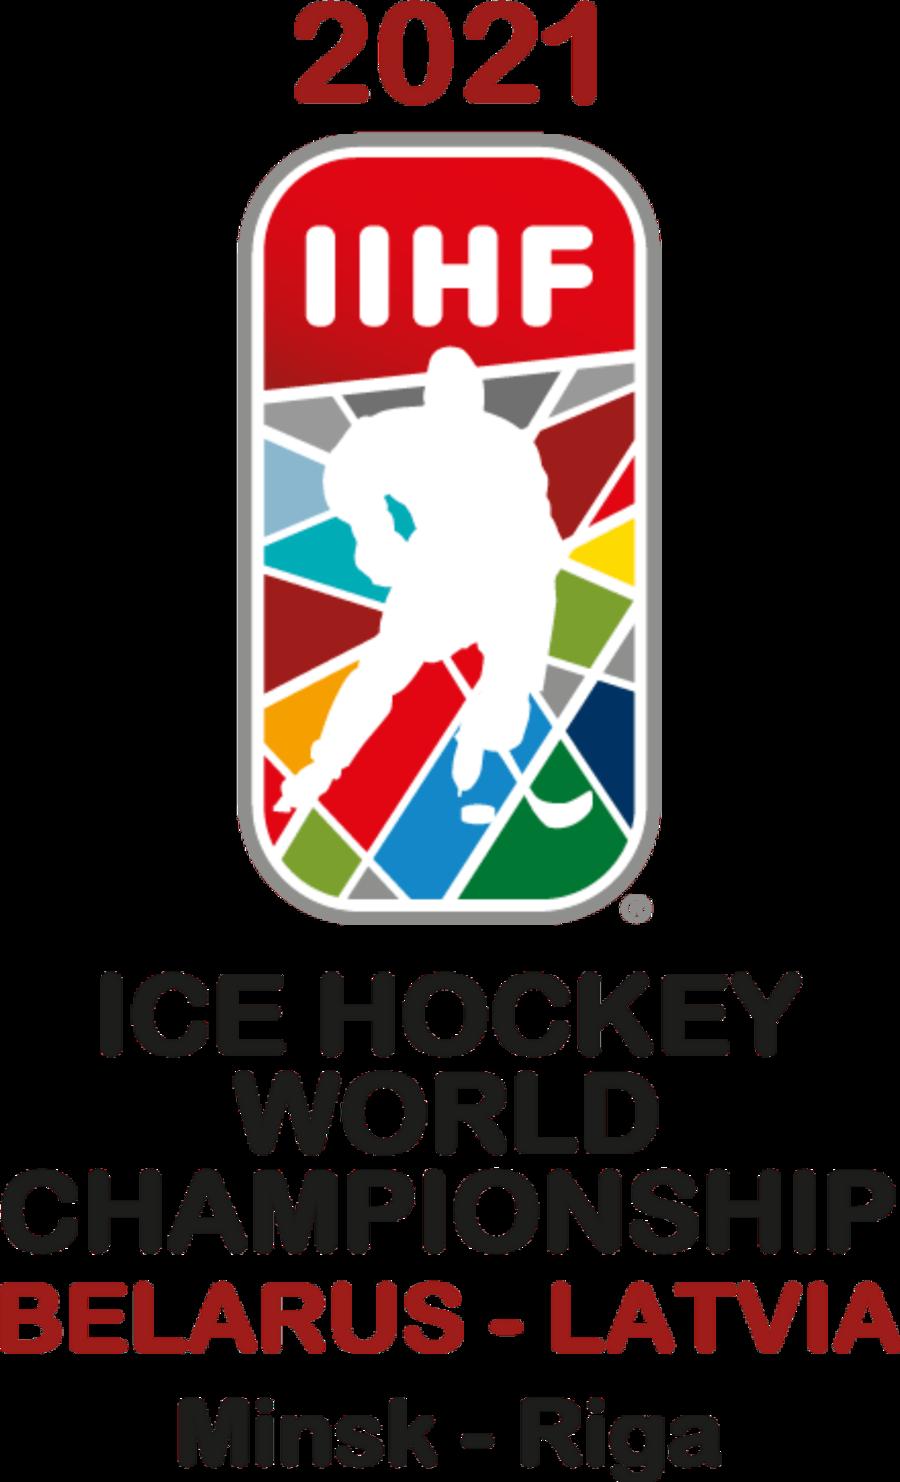 Eishockey 2021 Wm